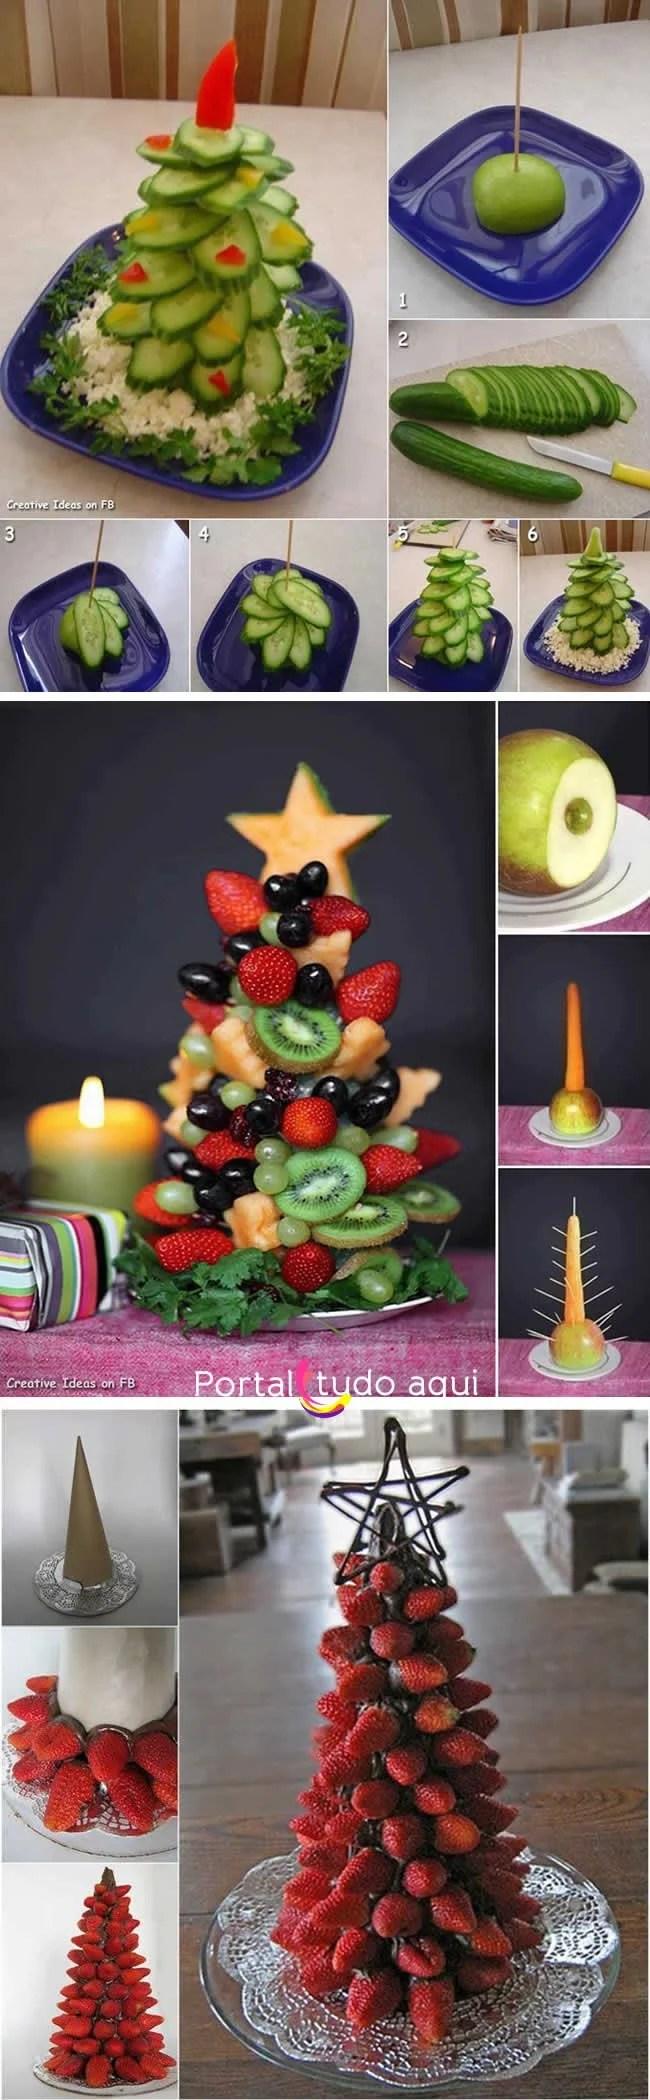 arvore-natal-comestivel-frutas-legumes-decoracao-passo-a-passo